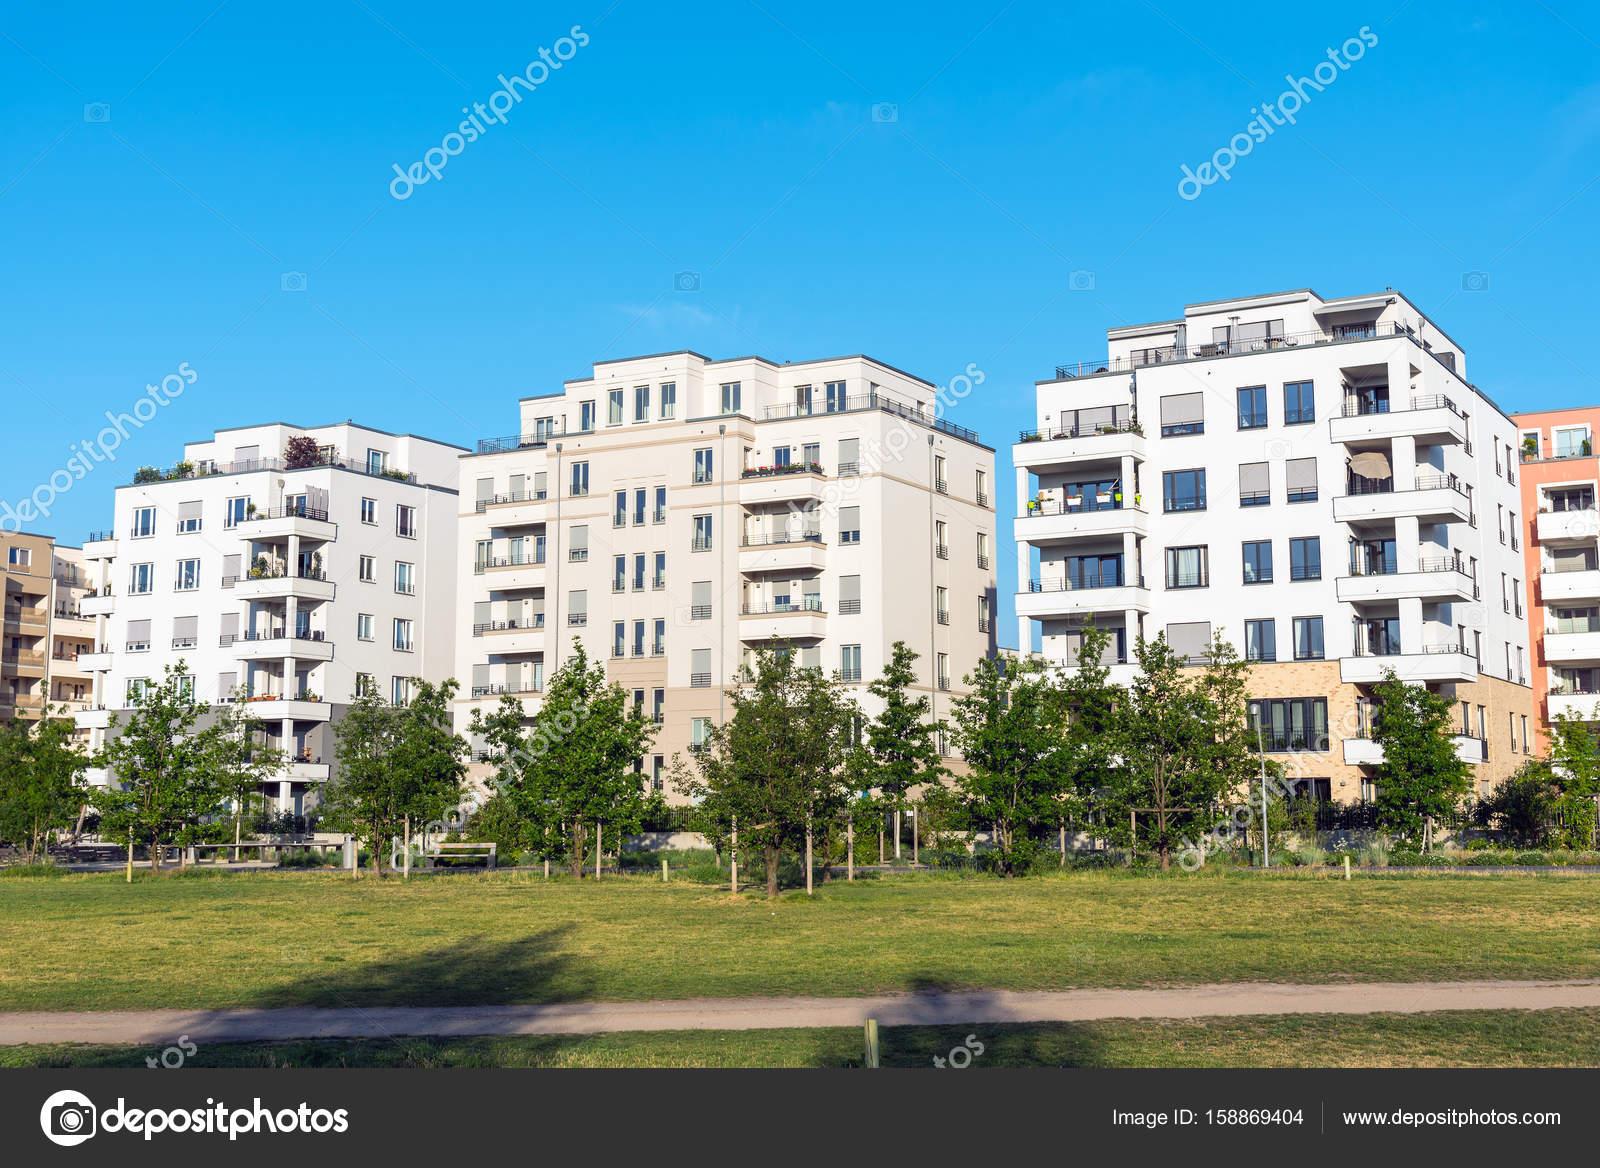 Geräumig Moderne Mehrfamilienhäuser Referenz Von Mehrfamilienhäuser In Berlin — Stockfoto